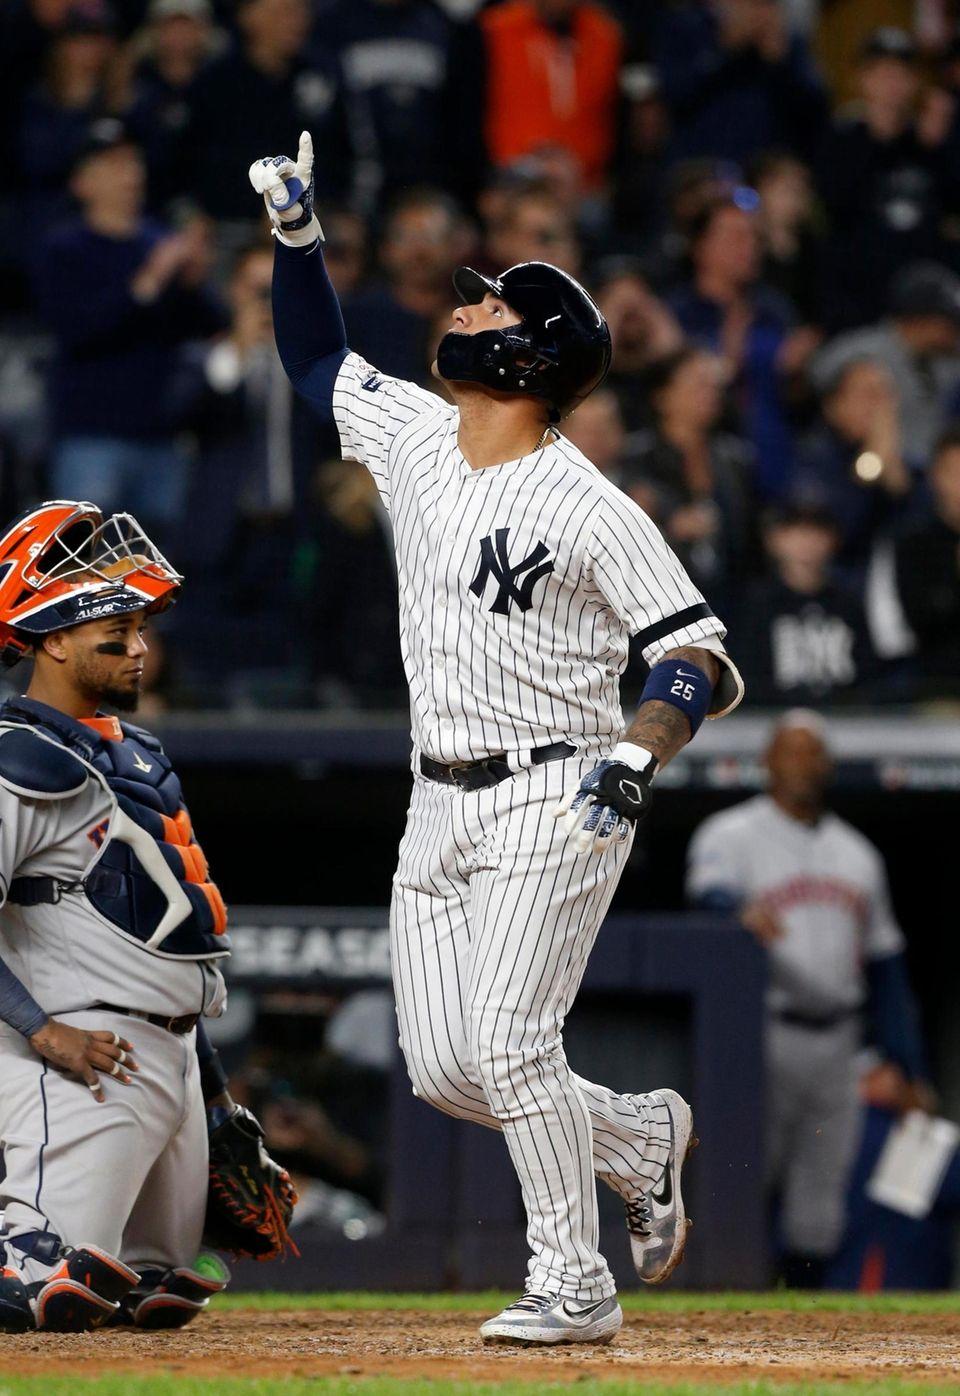 Gleyber Torres #25 of the New York Yankees